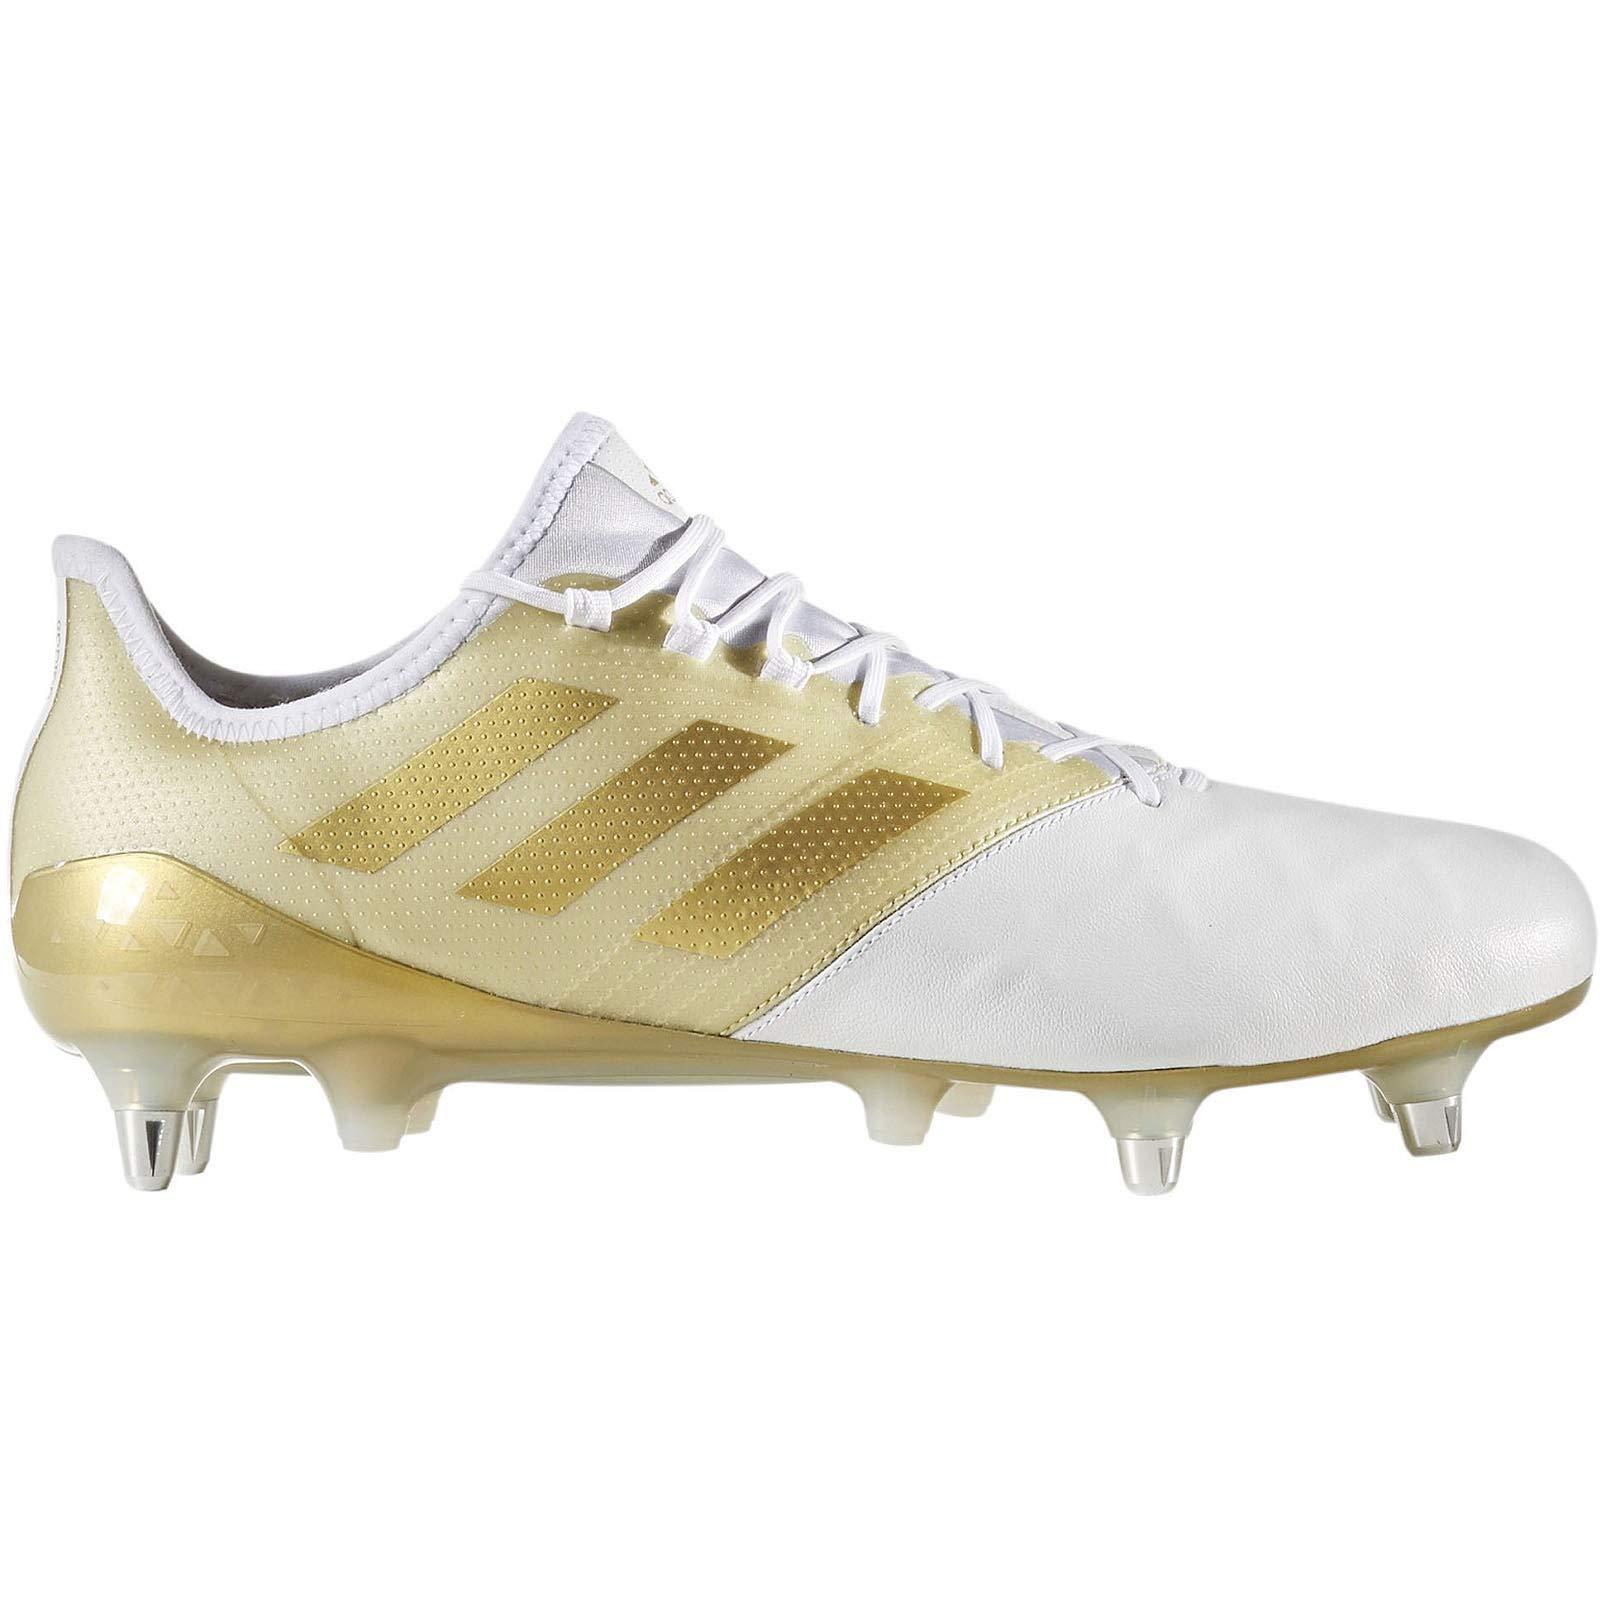 9d7354b1ccc Galleon - Adidas Kakari Light SG Rugby Boots - White Gold - UK 13